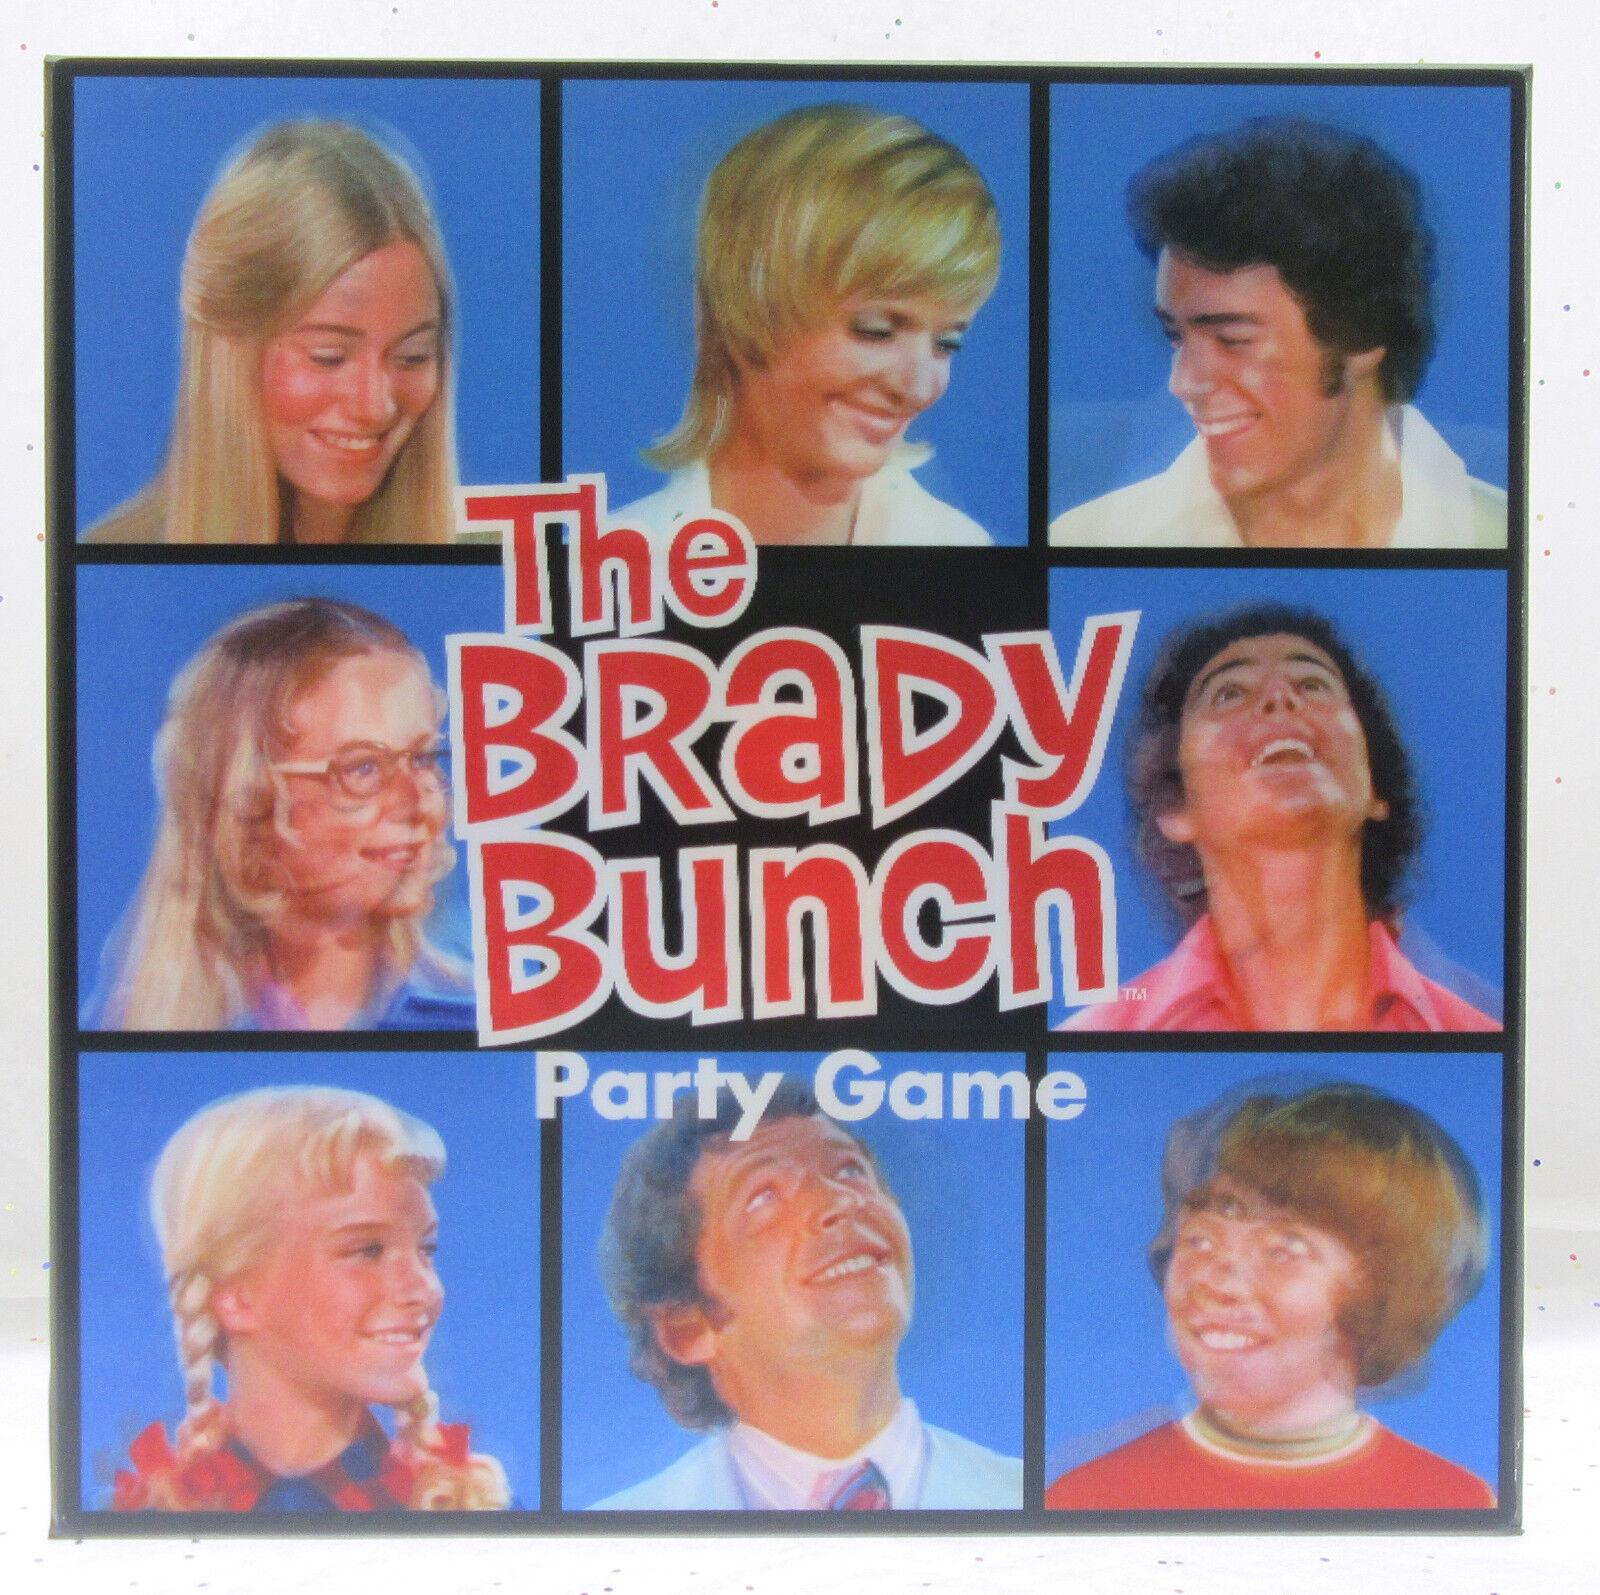 The Brady Bunch  Party Game  3D Box  Prospero Hall  Nostalgic Toy